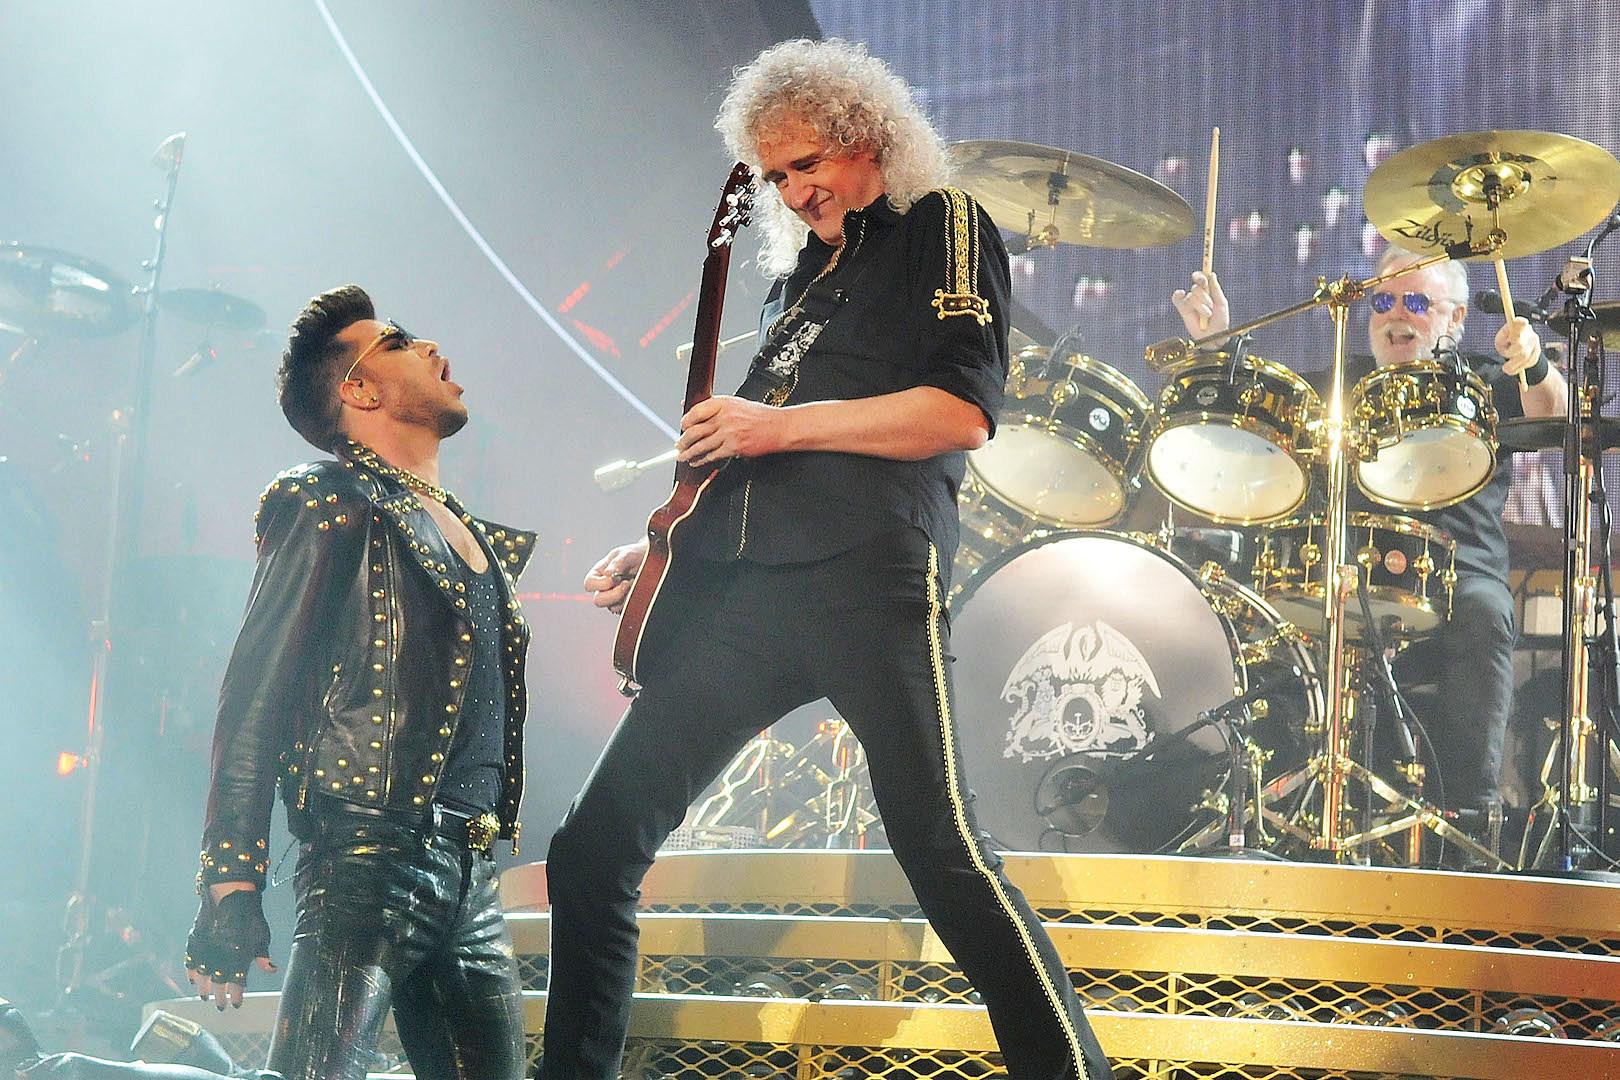 Queen Adam Lambert Unveil 2019 Rhapsody Tour Dates